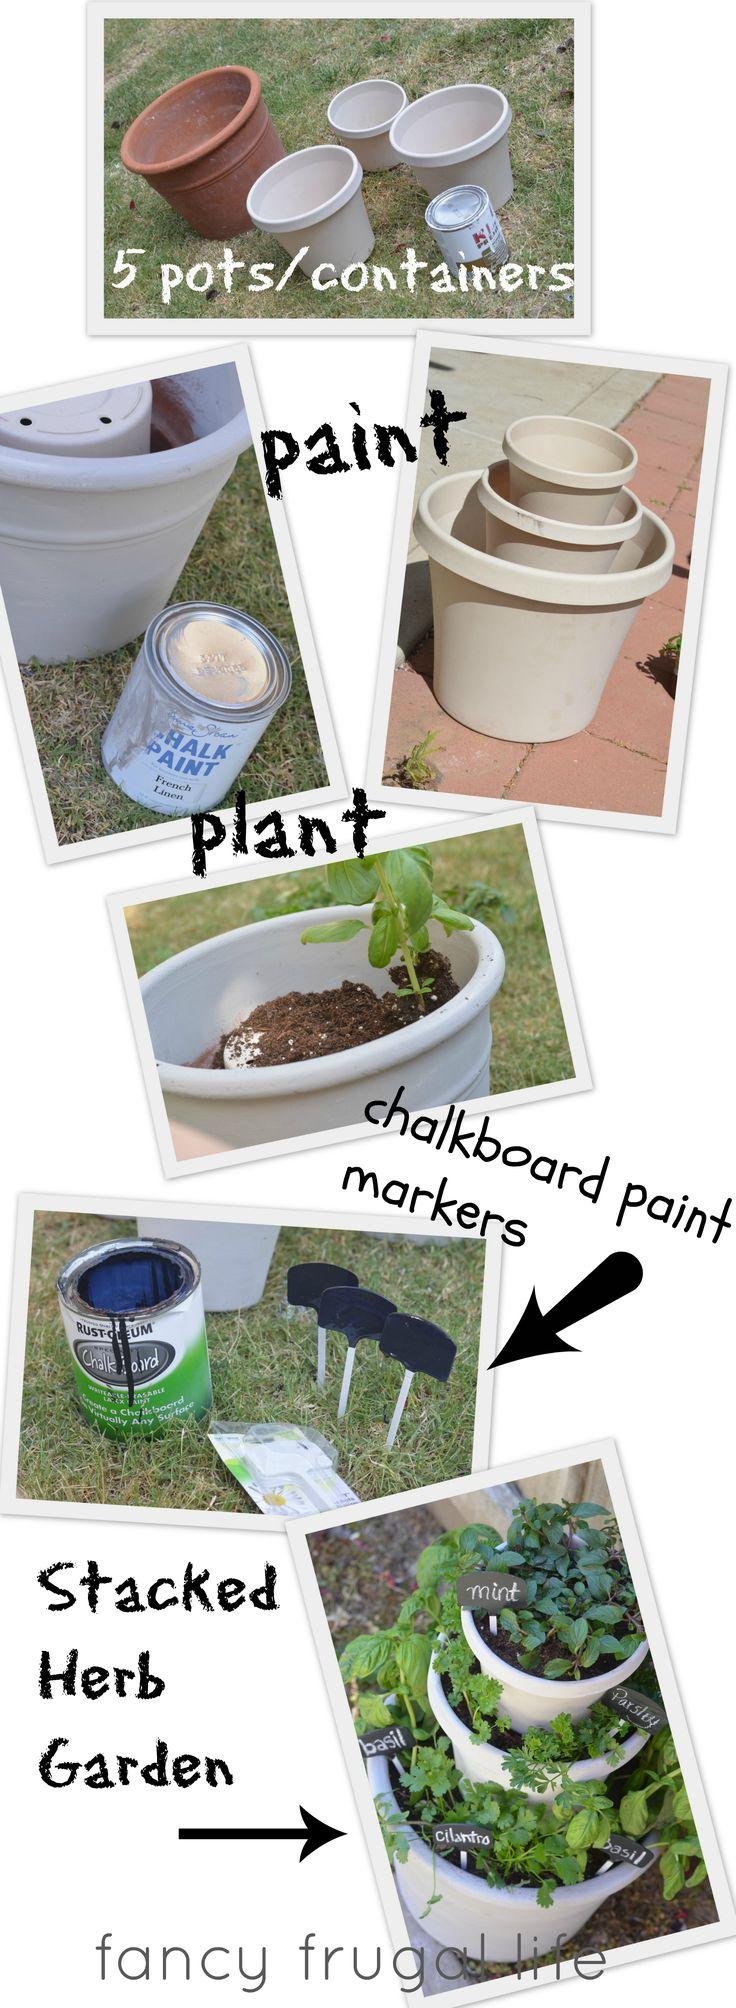 best 25 potted herb gardens ideas on pinterest patio herb gardens herb pots and kitchen herb gardens